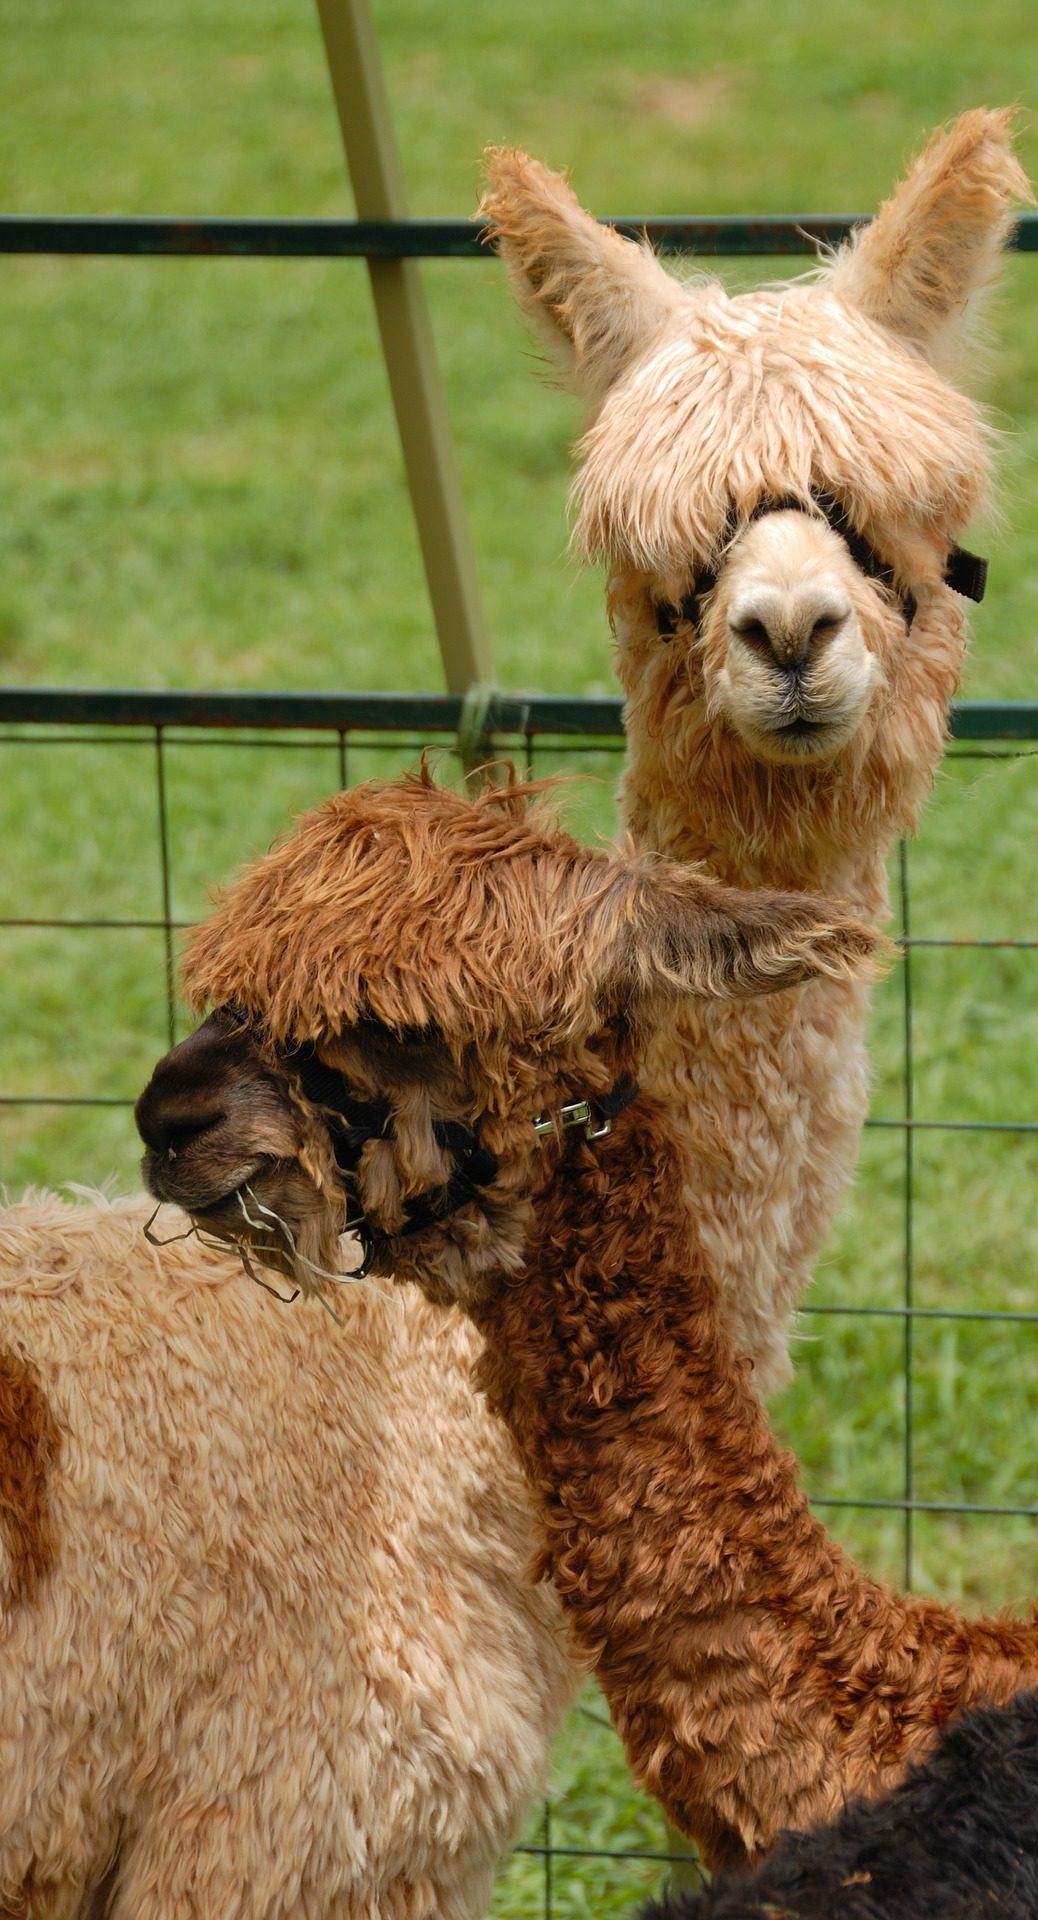 Alpacas, γούνα, μαλλί, αγρόκτημα, Περού - Wallpapers HD - Professor-falken.com